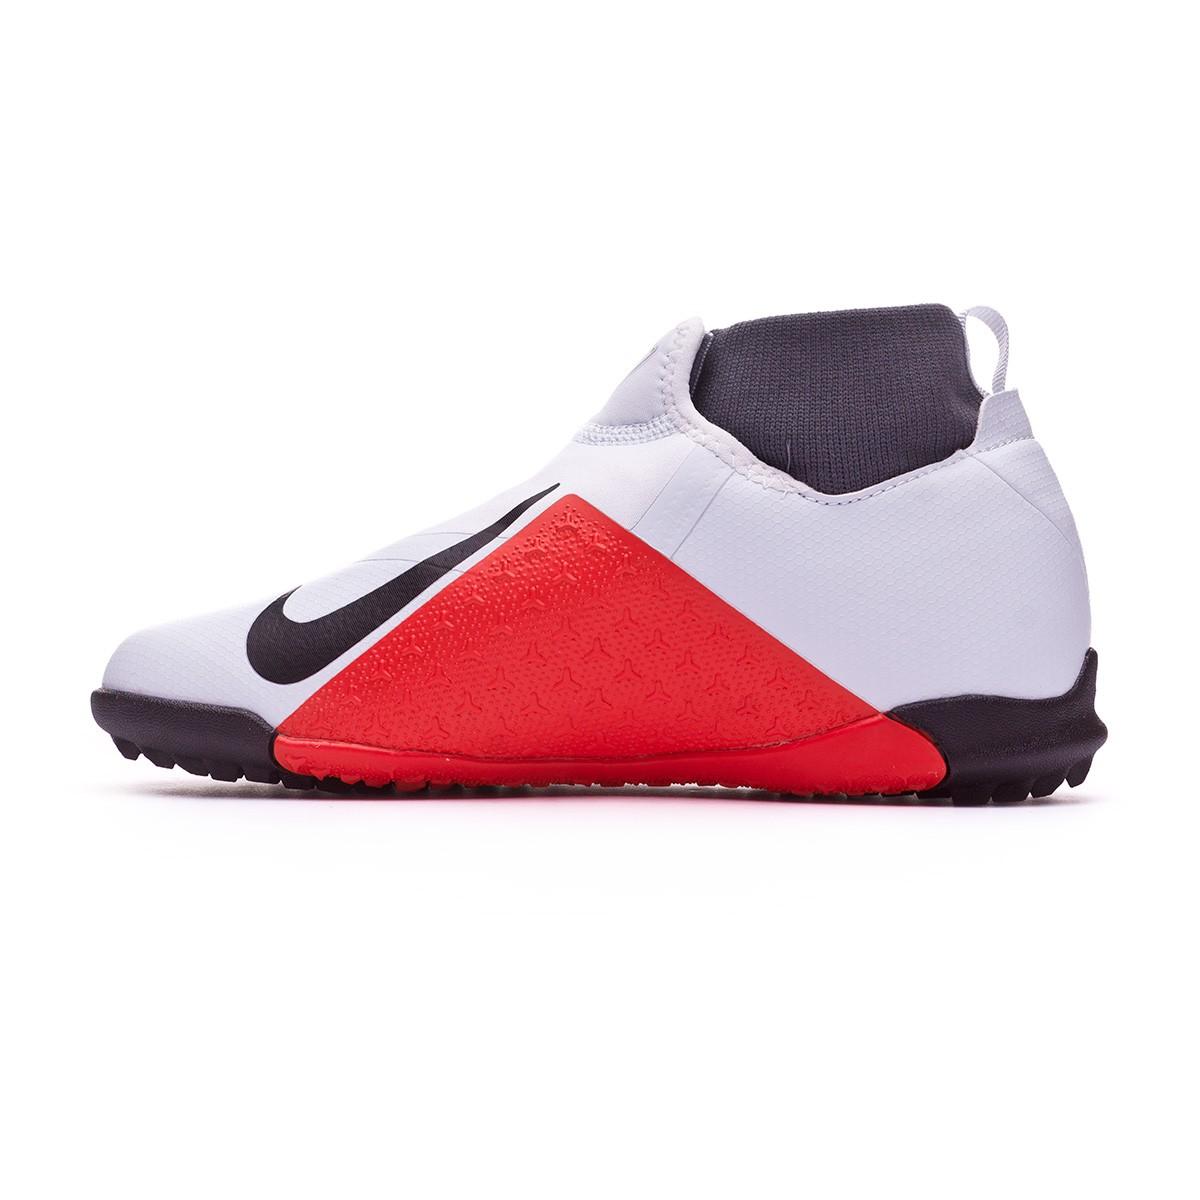 62ddd0f82 Football Boot Nike Kids Phantom Vision Academy DF Turf Pure platinum-Black-Light  crimson-Dark grey - Football store Fútbol Emotion